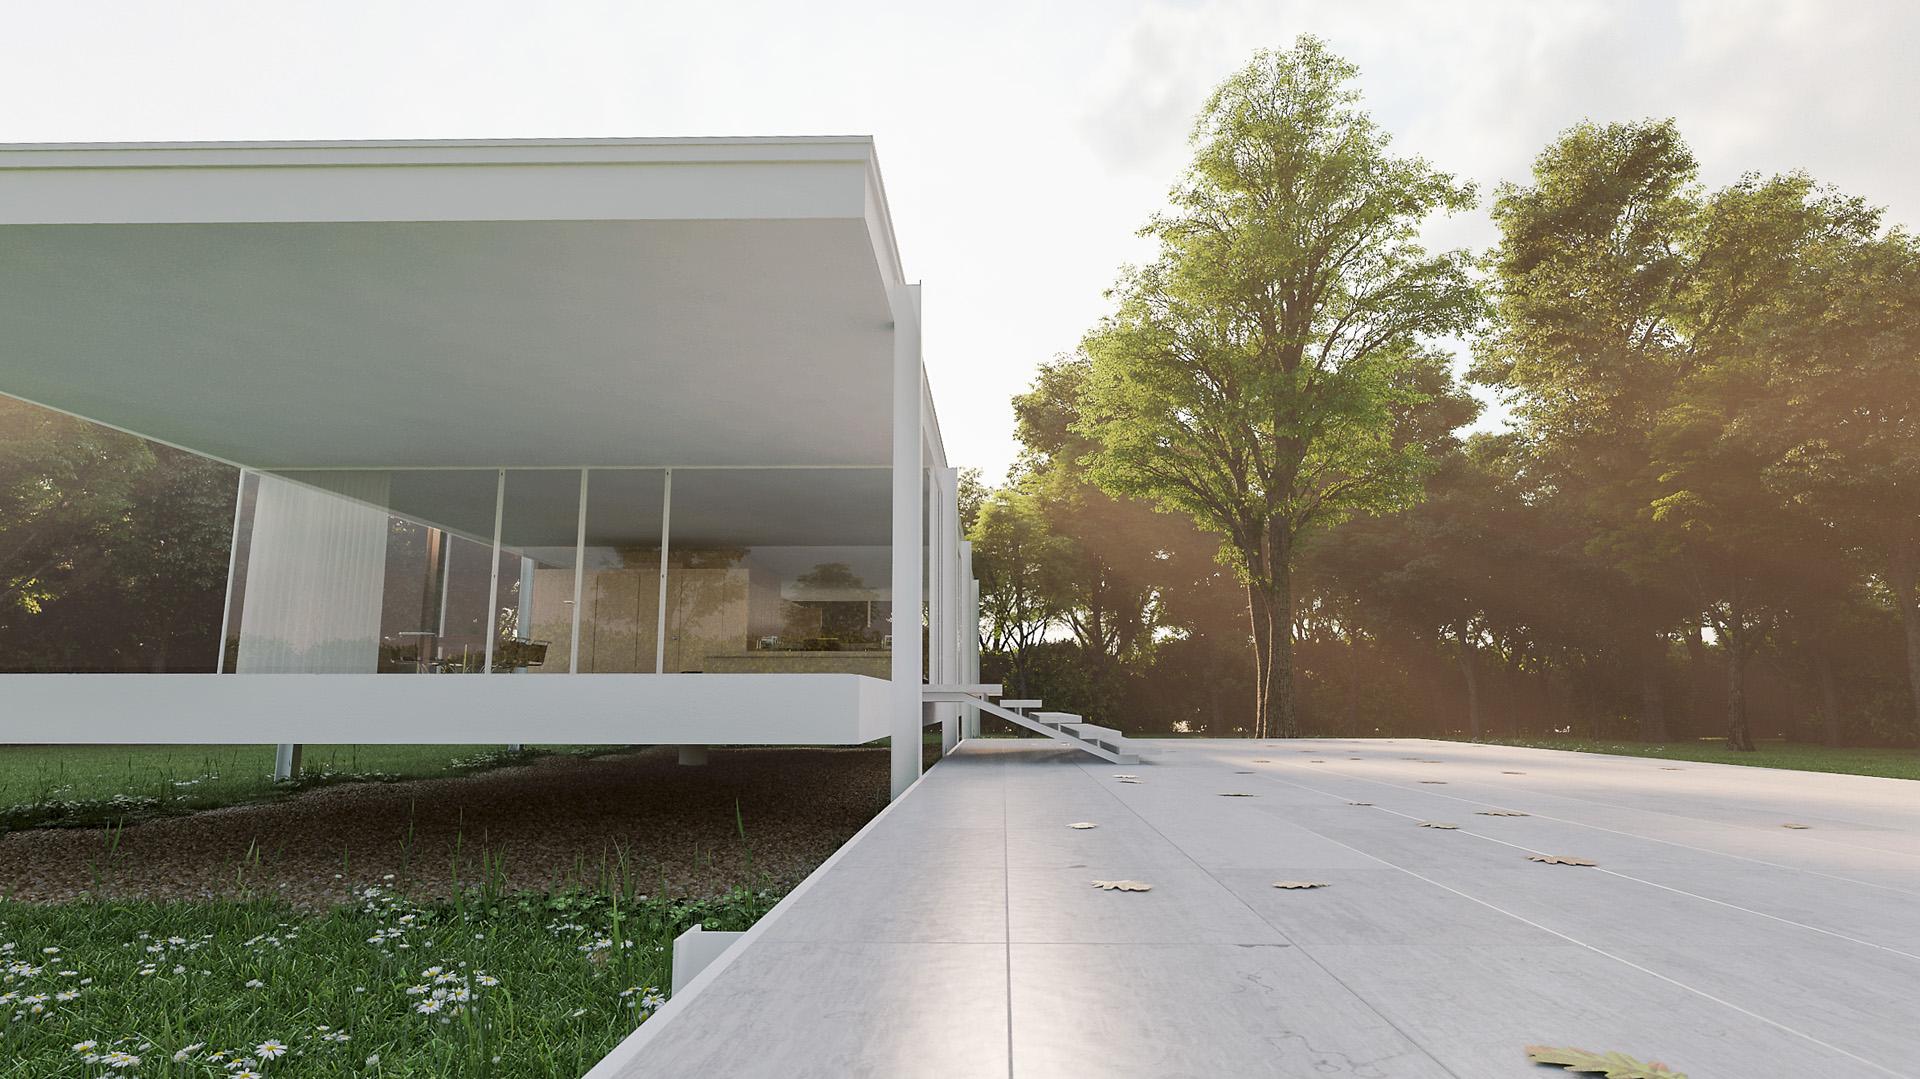 farnsworth house avocad studio ludwig mies van der rohe